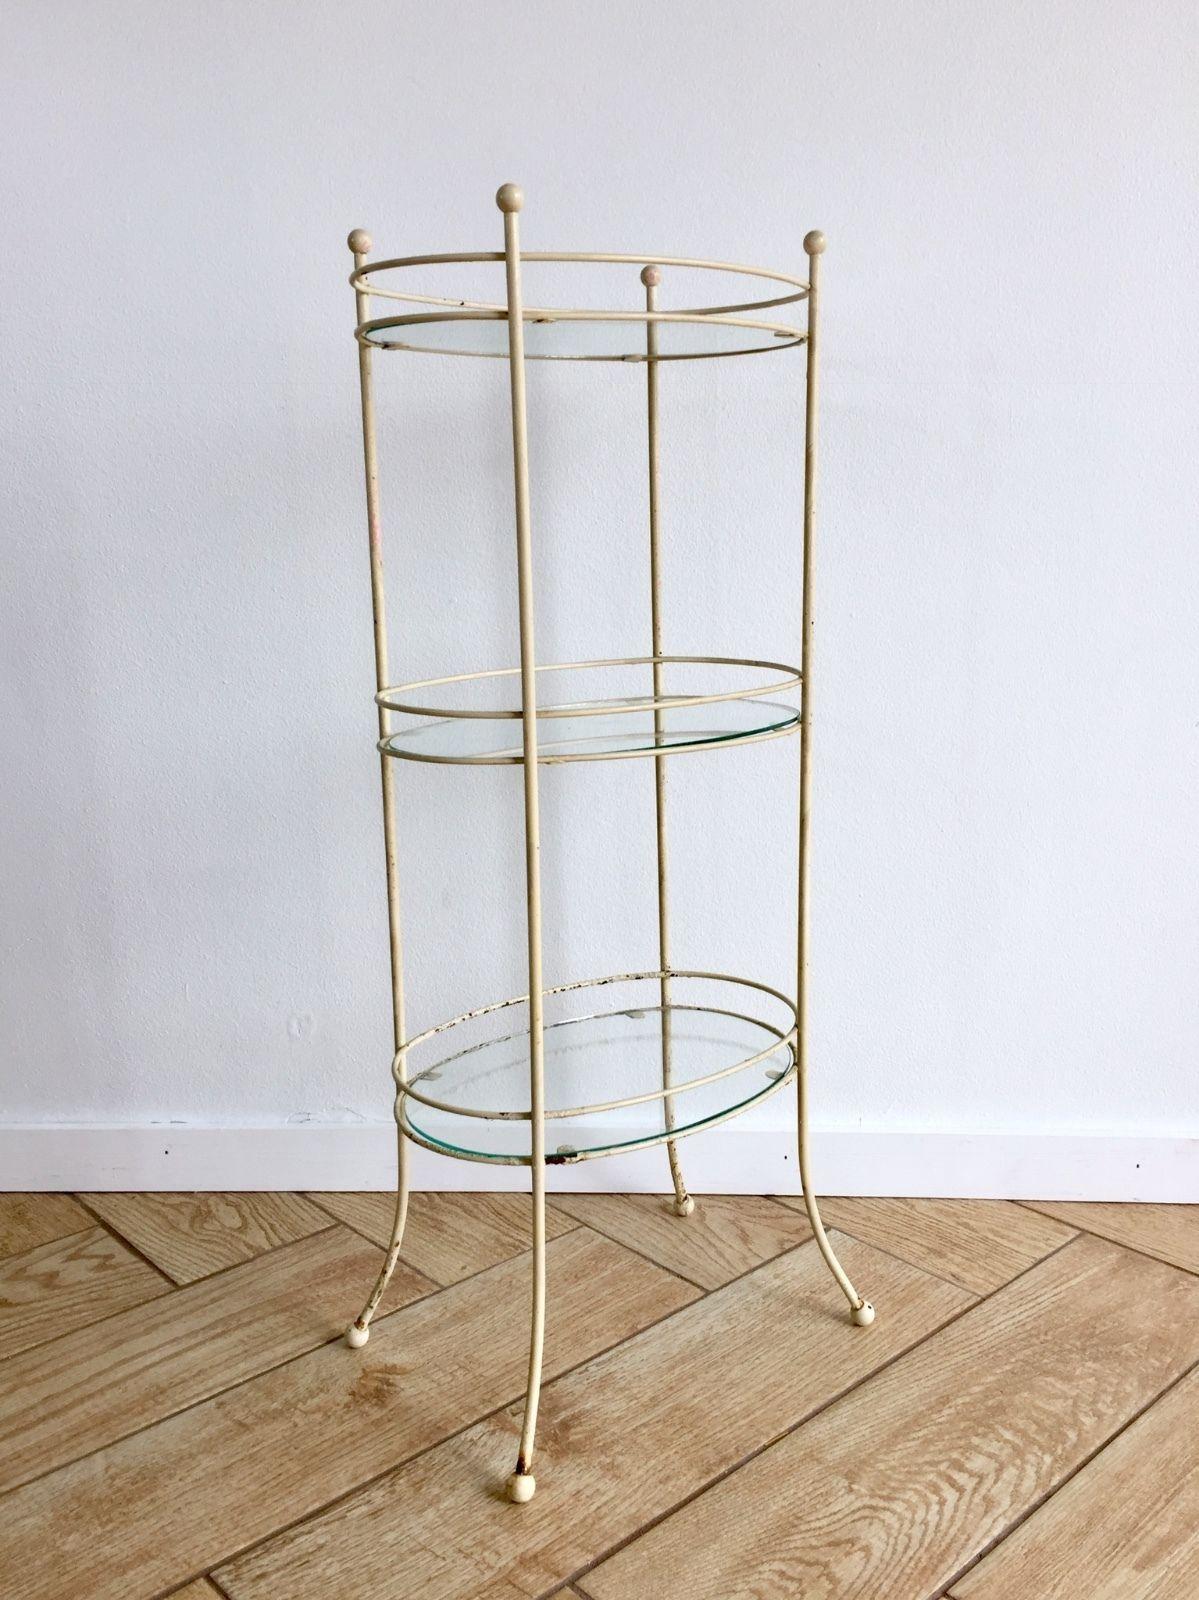 Vintage Glass Metal 3 Tier Standing Shelf Plant Stand Shelving